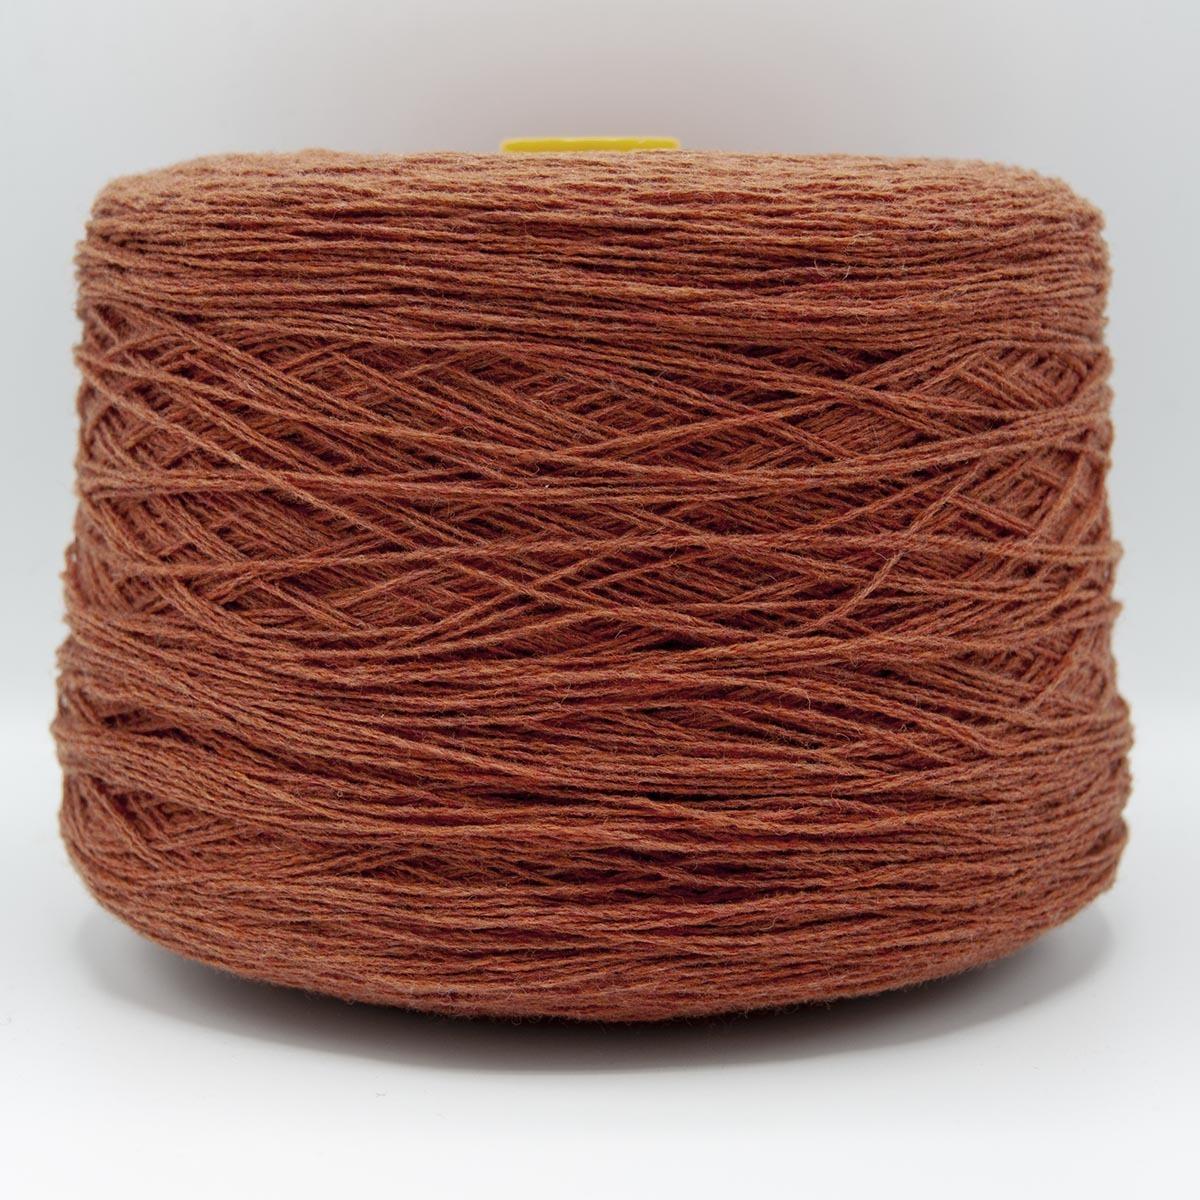 Knoll Yarns Merino Lambswool - 308